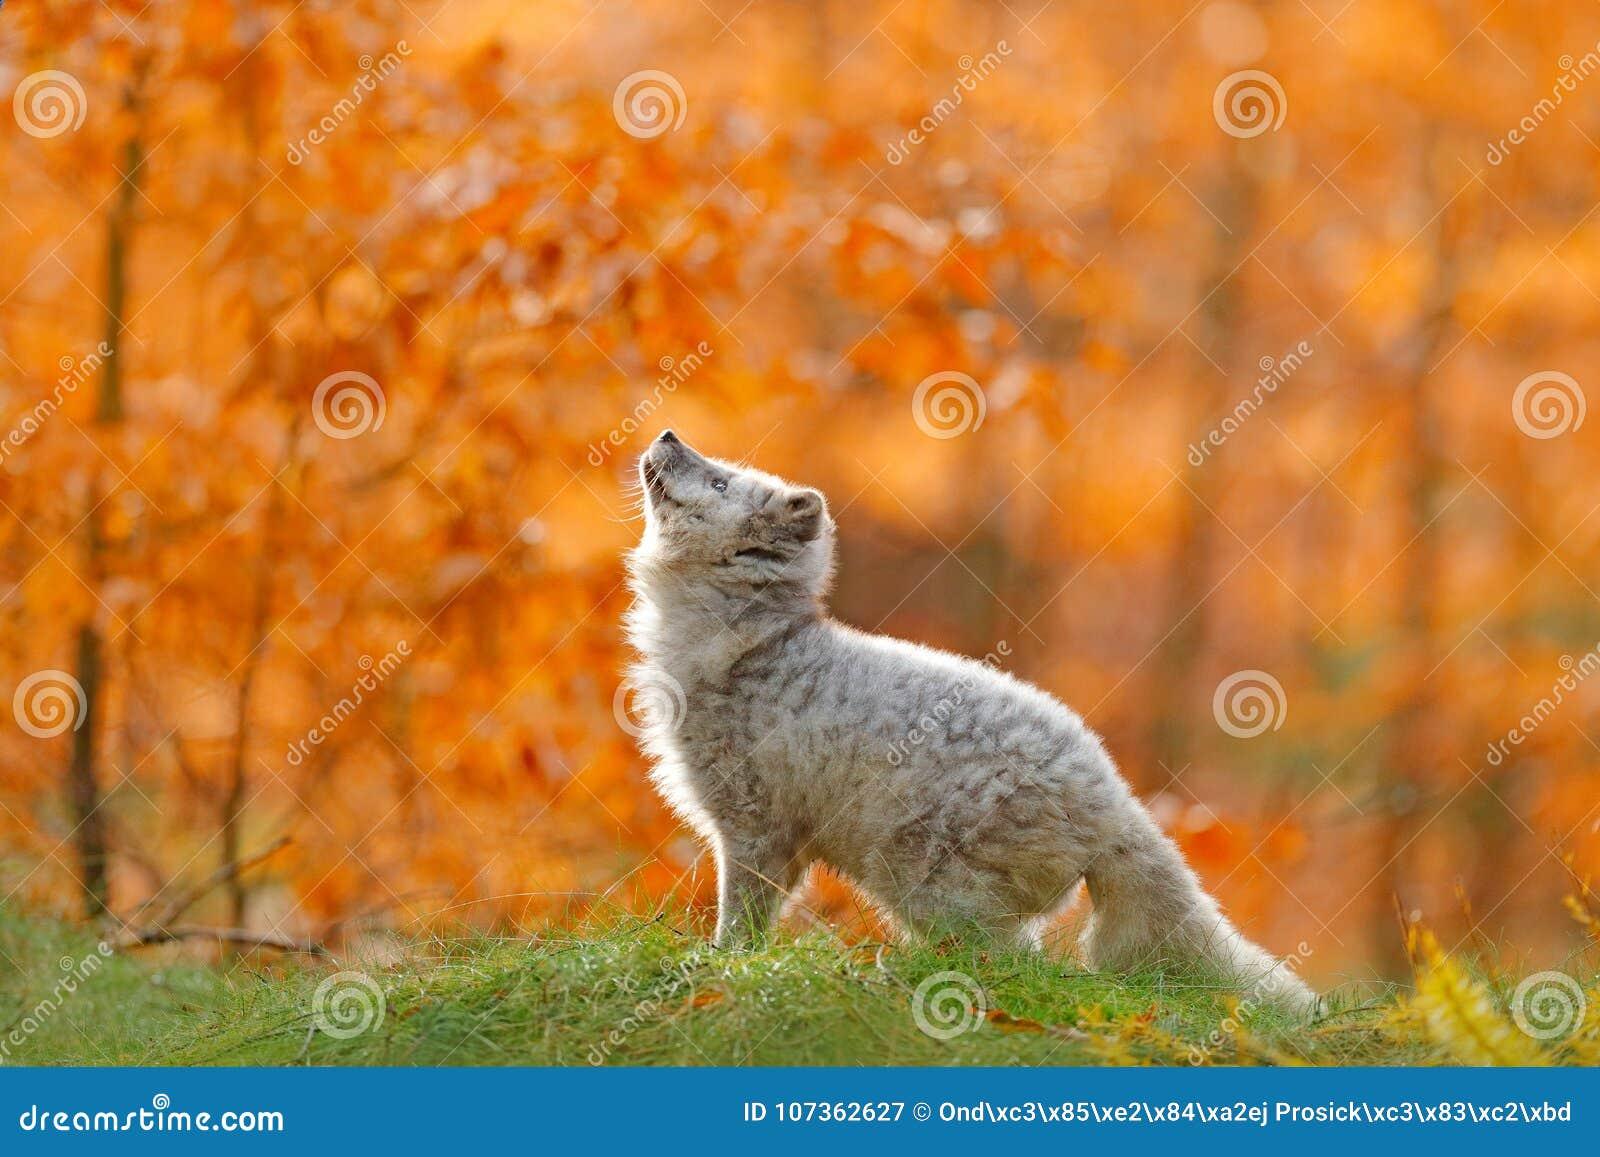 Arctic polar fox running in orange autumn leaves. Cute Fox, fall forest. Beautiful animal in the nature habitat. Orange fox, detai